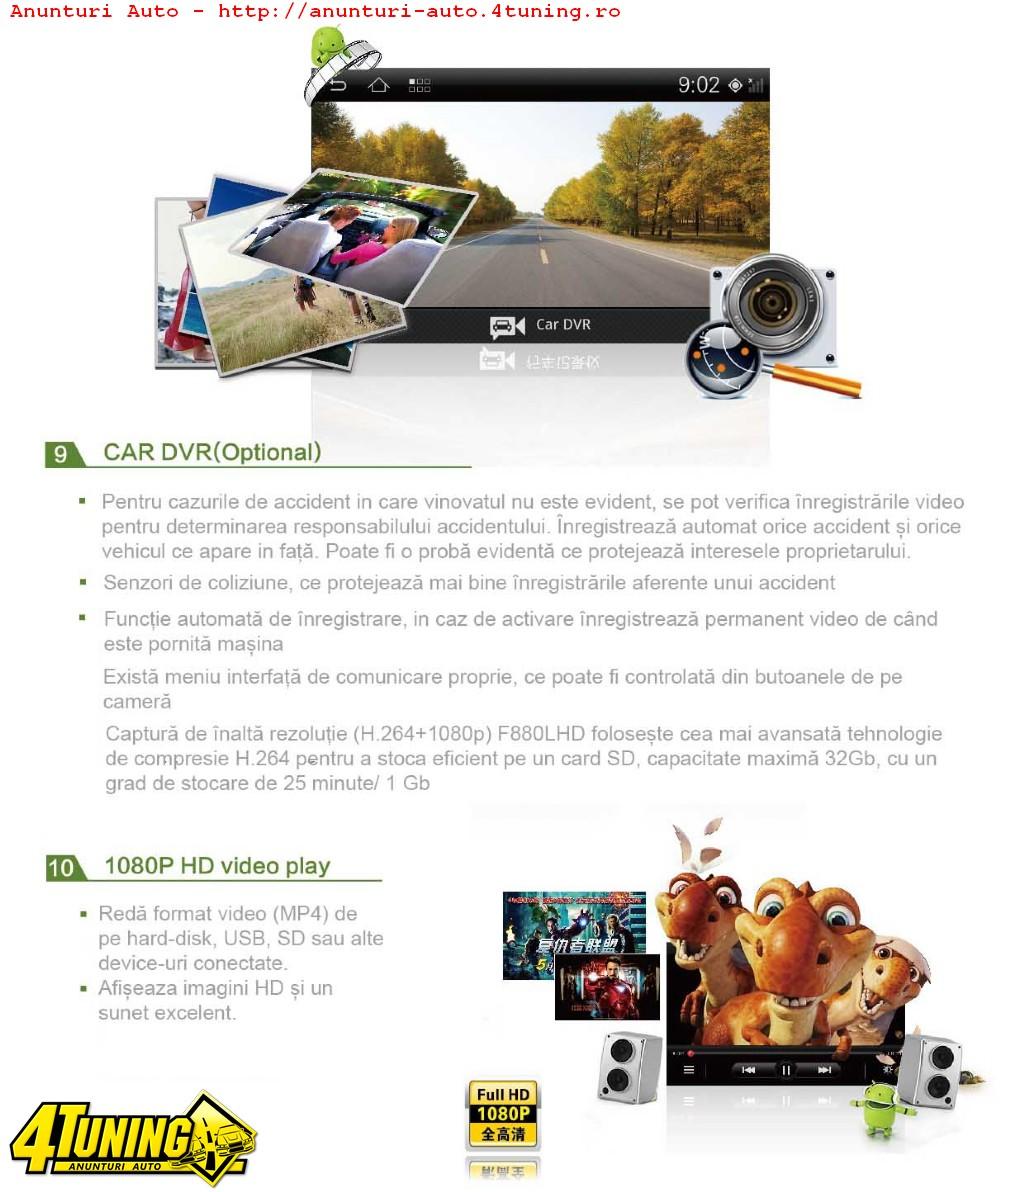 NAVIGATIE ANDROID DEDICATA AUDI A3 WITSON W2 I049 PLATFORMA S150 INTERNET 3G WIFI PROCESOR SAMSUNG A8 1GHZ DVR HARD INTERN CARKIT BLUETOOTH PRELUARE AGENDA TELEFONICA MIRROR LINK MODEL PREMIUM